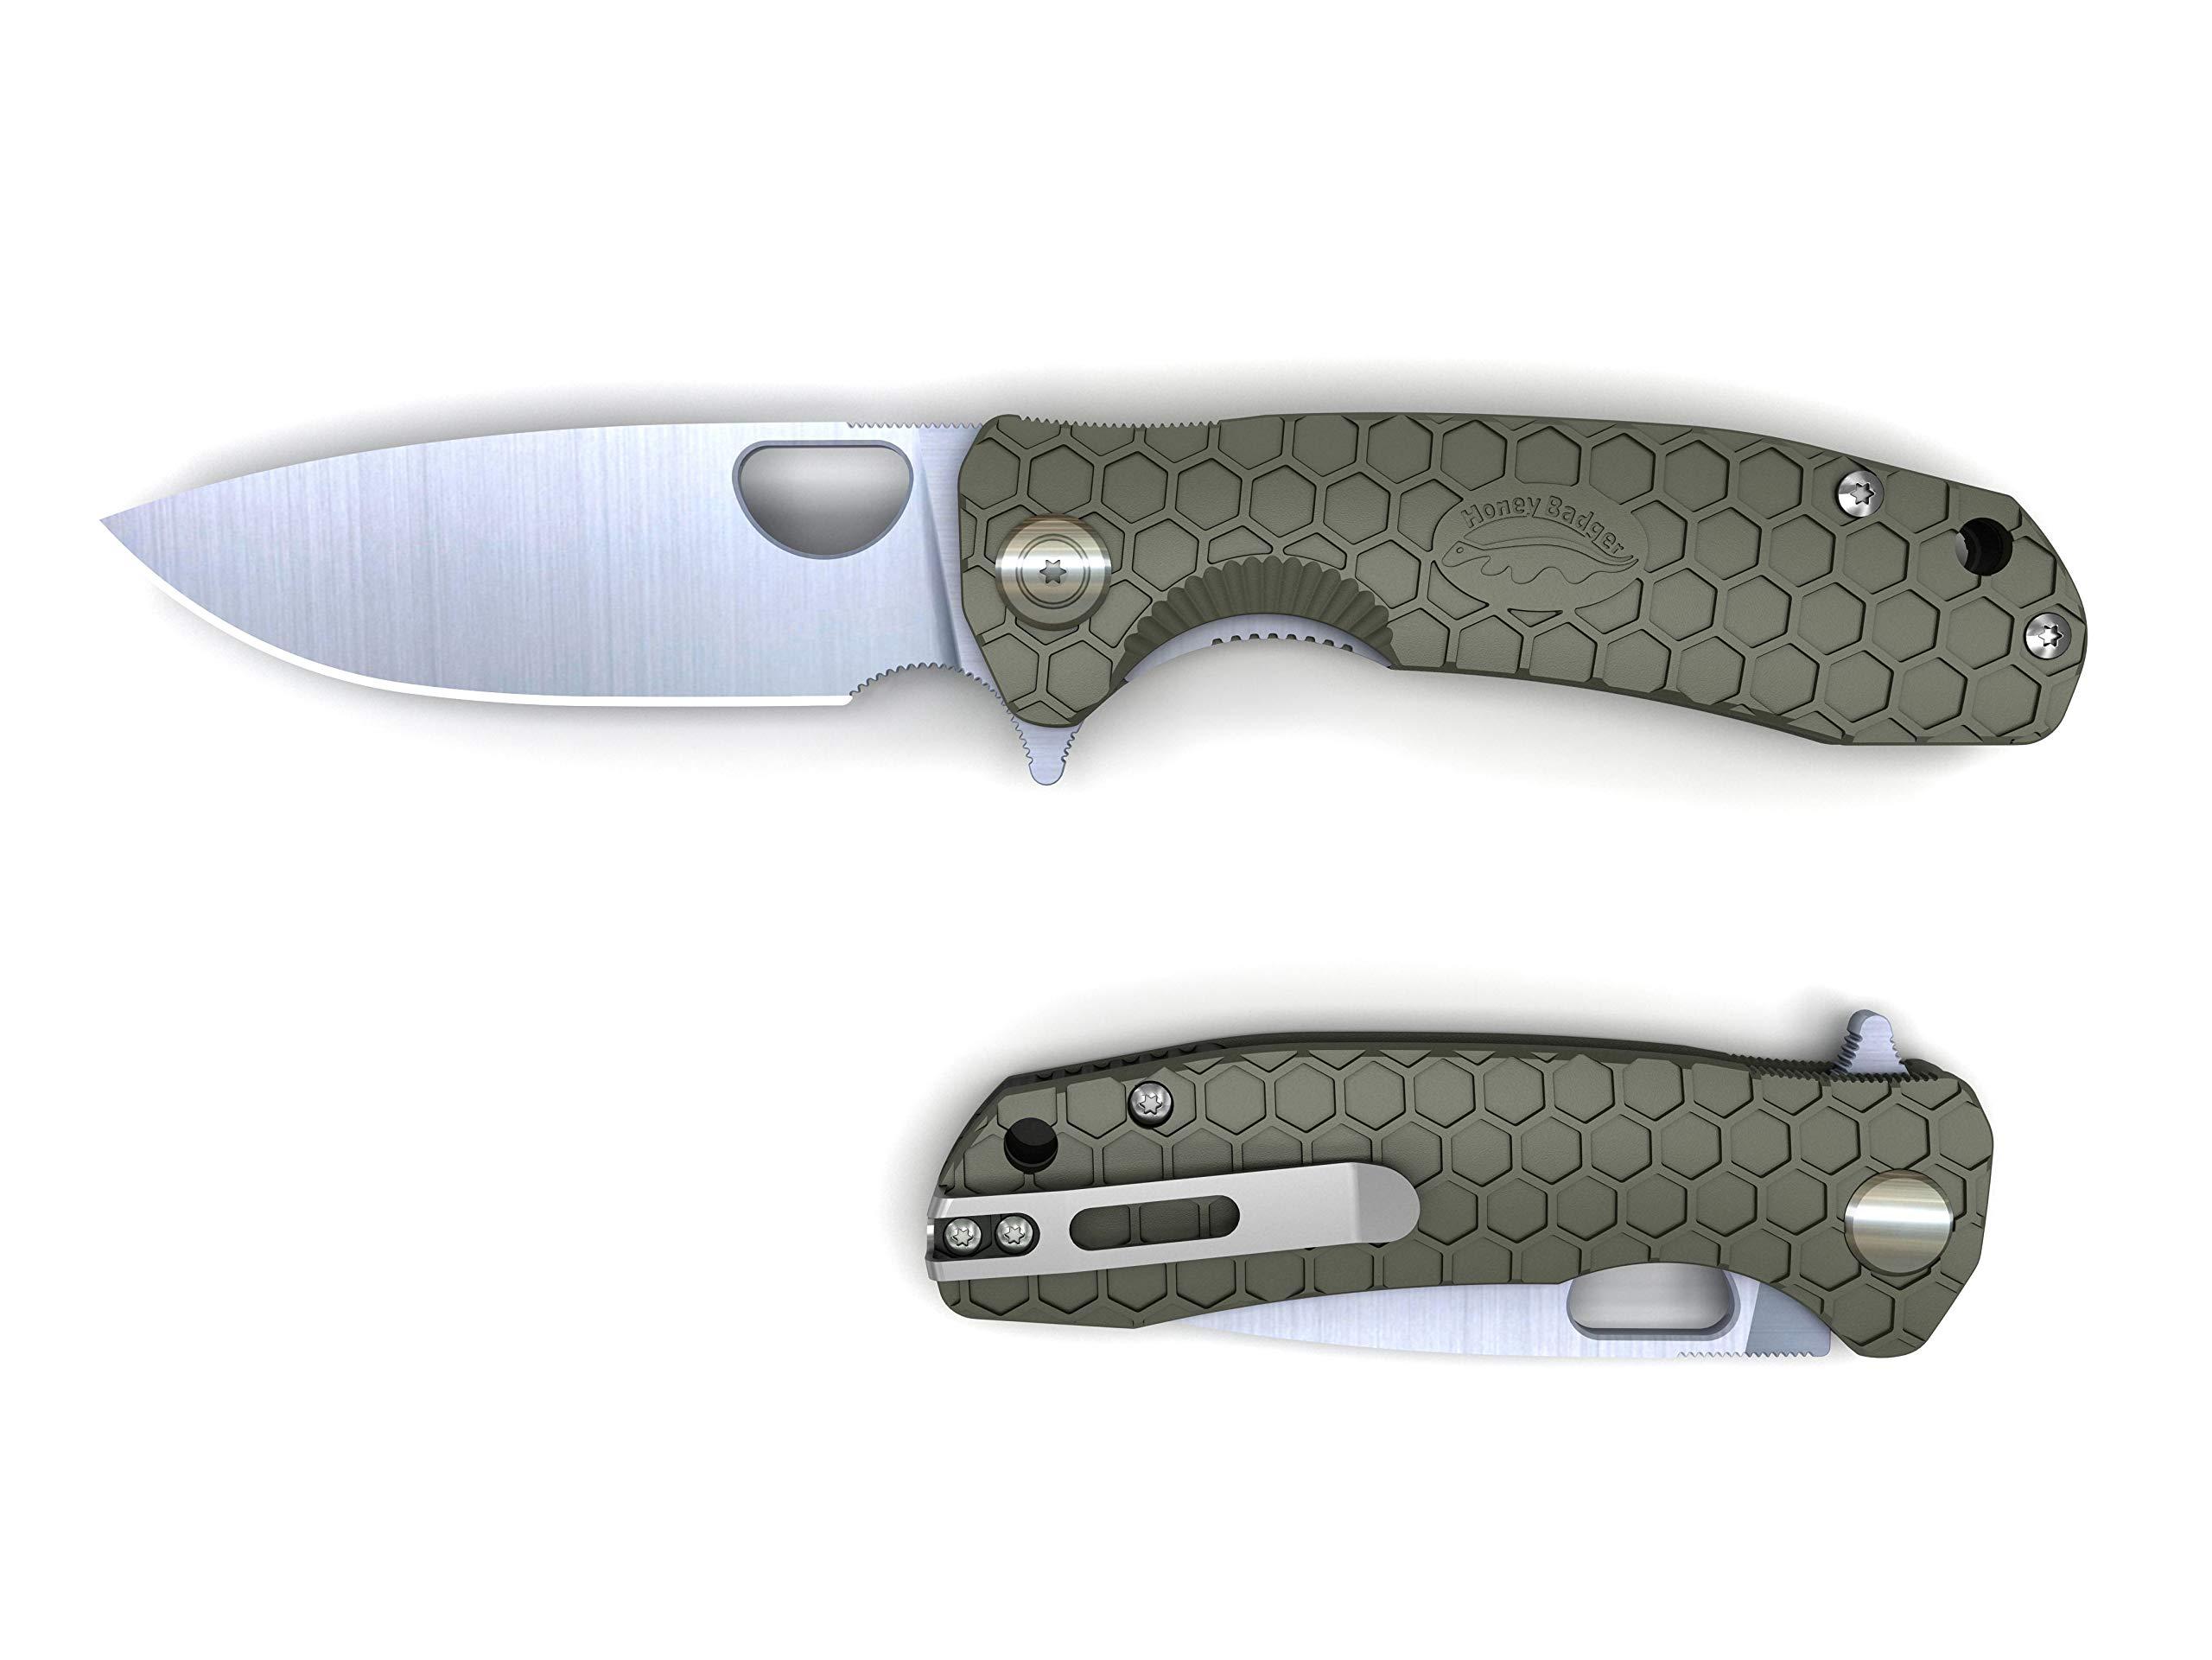 Honey Badger Folding Knife Ball Bearing Flipper Liner 8cr13MOV Blade FRN Handles Deep Pocket Carry in Gift Box incl Torx Wrench, 6.54'' Fullly Open, 3.7'' Closed, 2.81'' Blade, 2.57 Oz, Small, Green